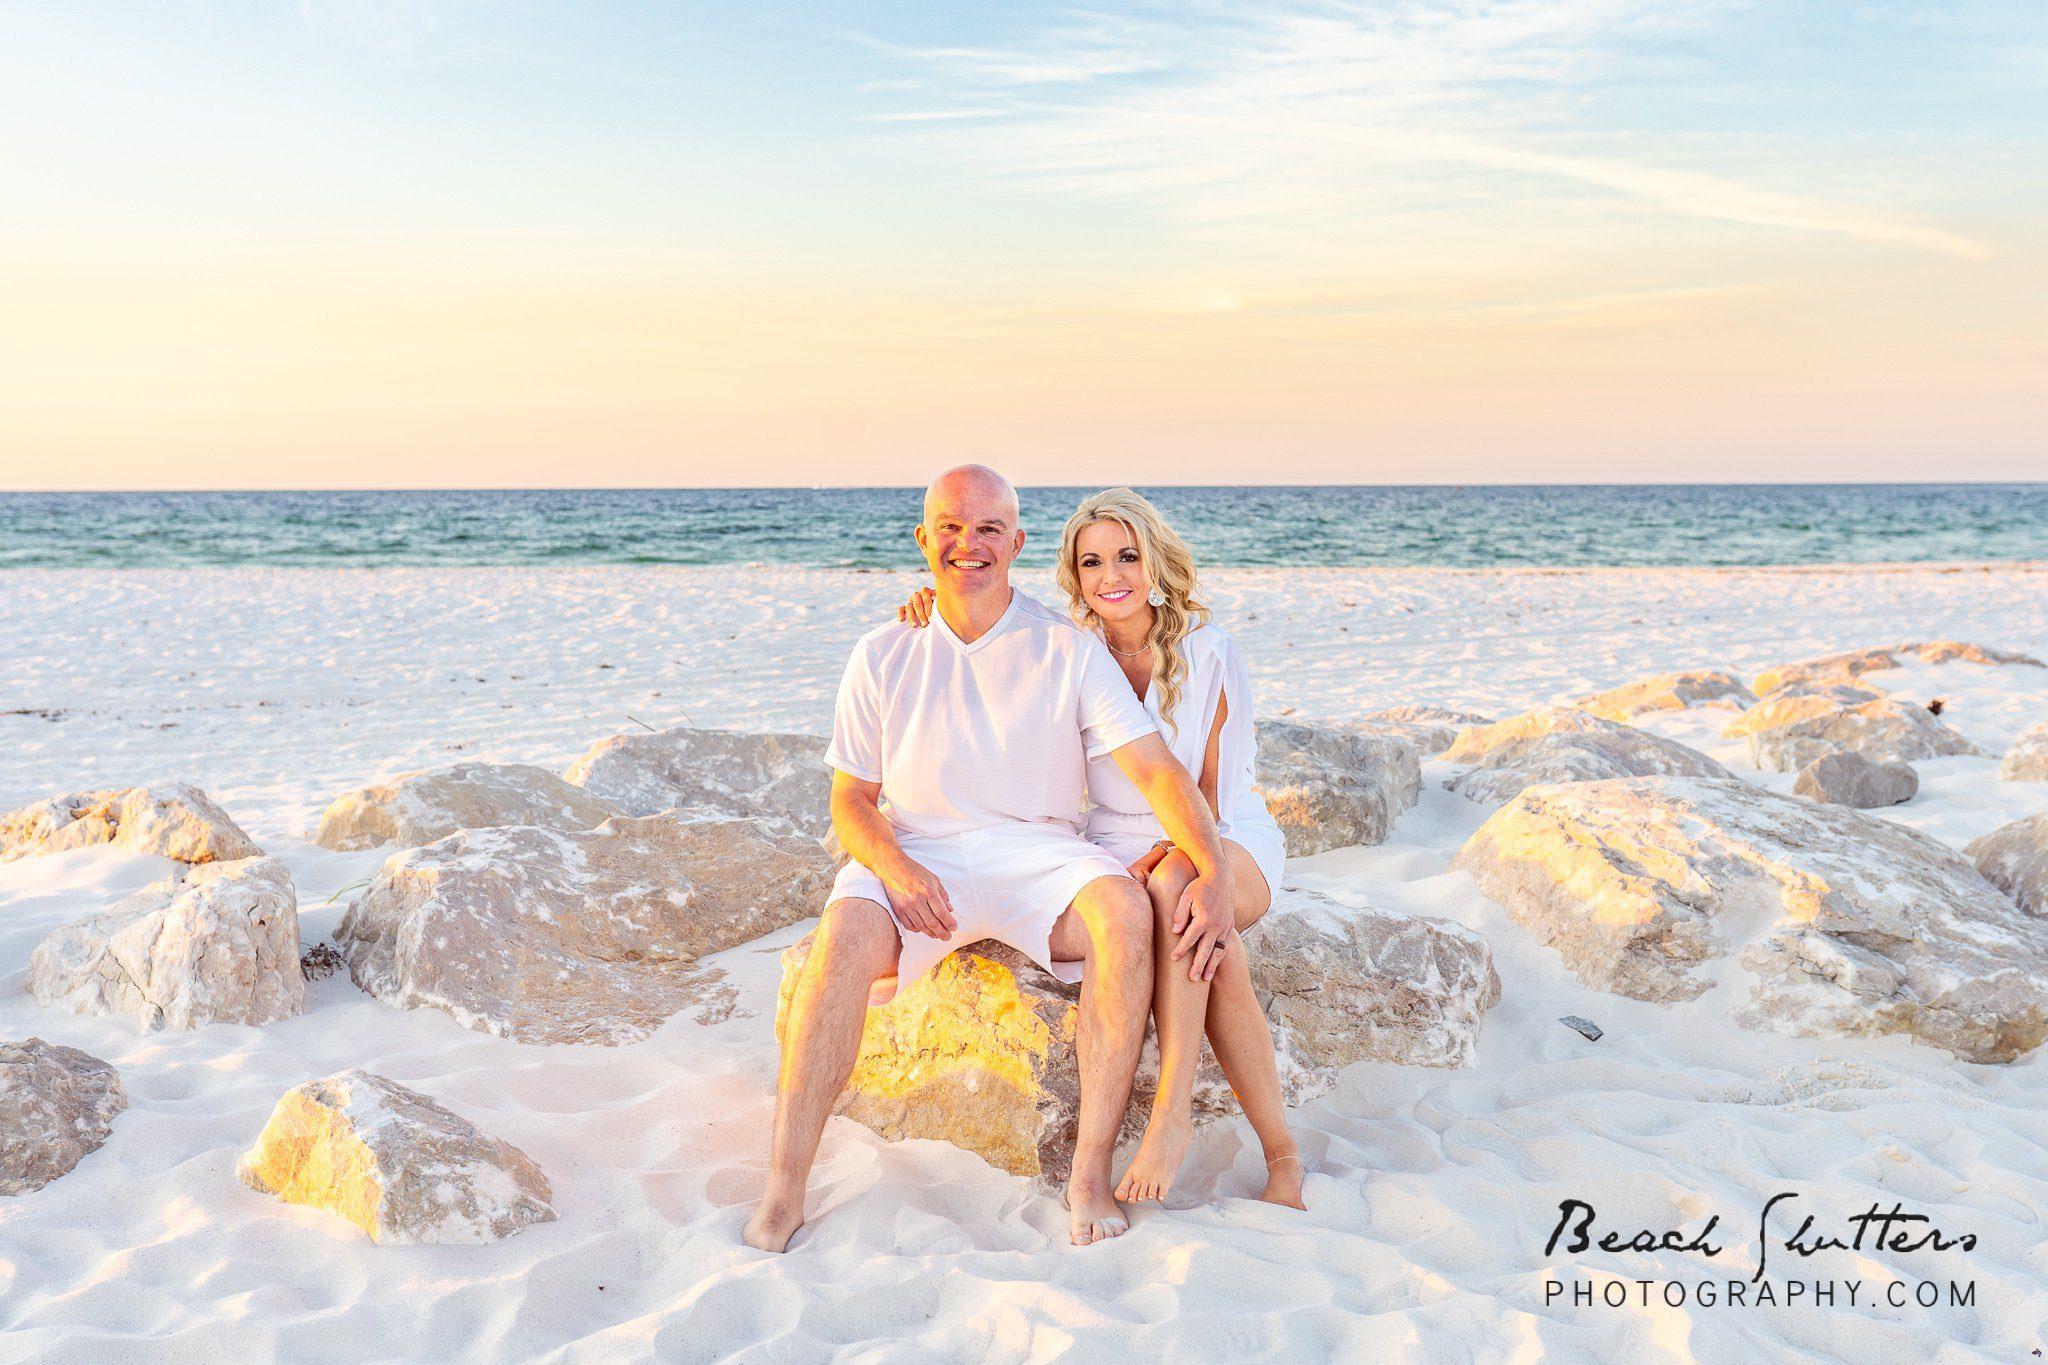 Orange Beach Alabama photo locations